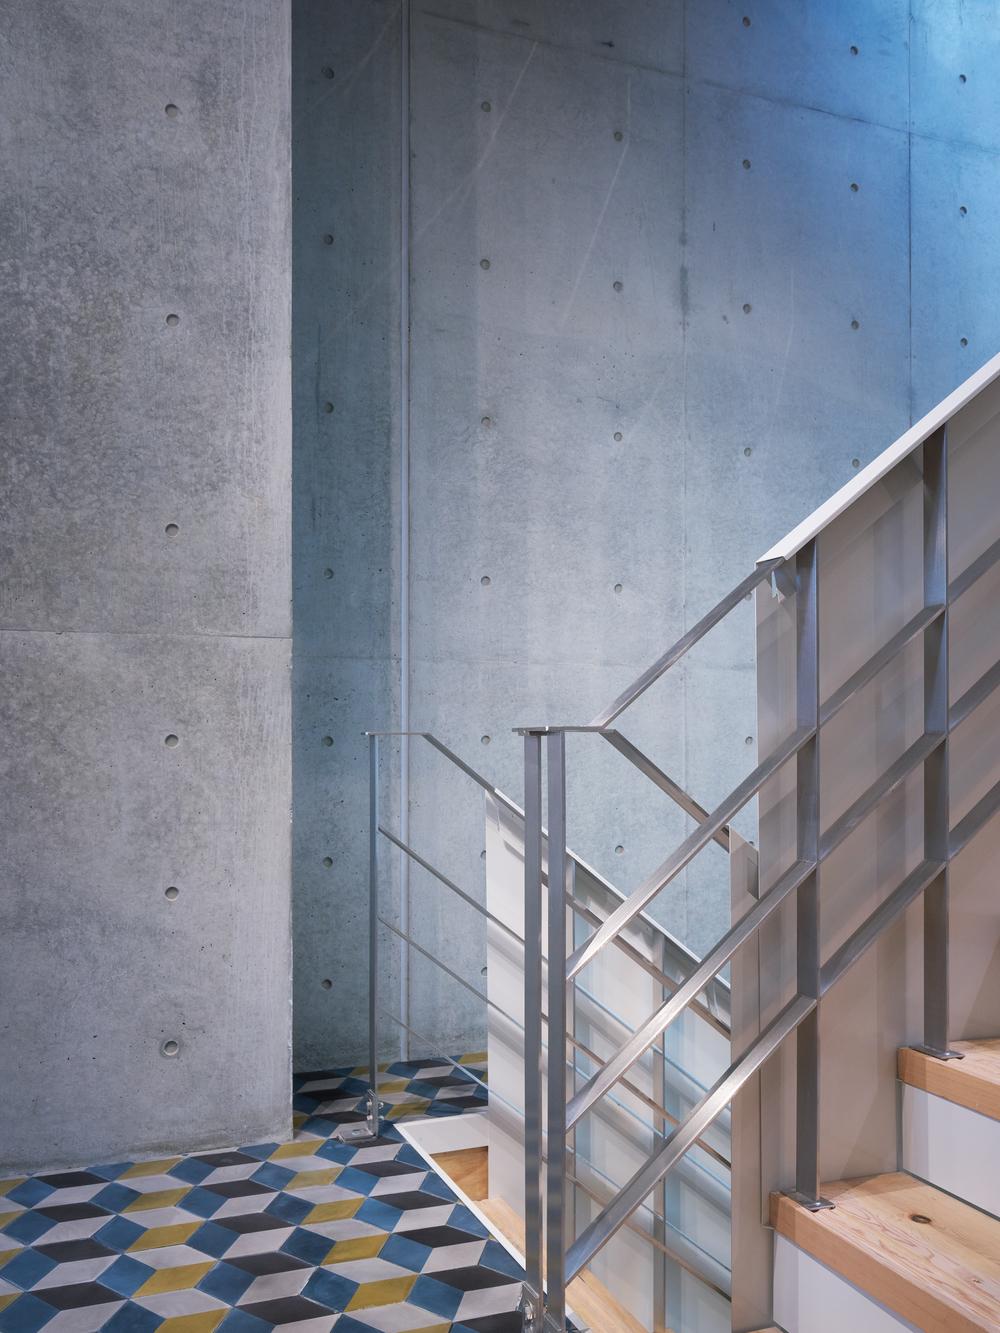 30_Cut Architectures_ l Echoppe Tokyo27 Copyright David foessel.jpg